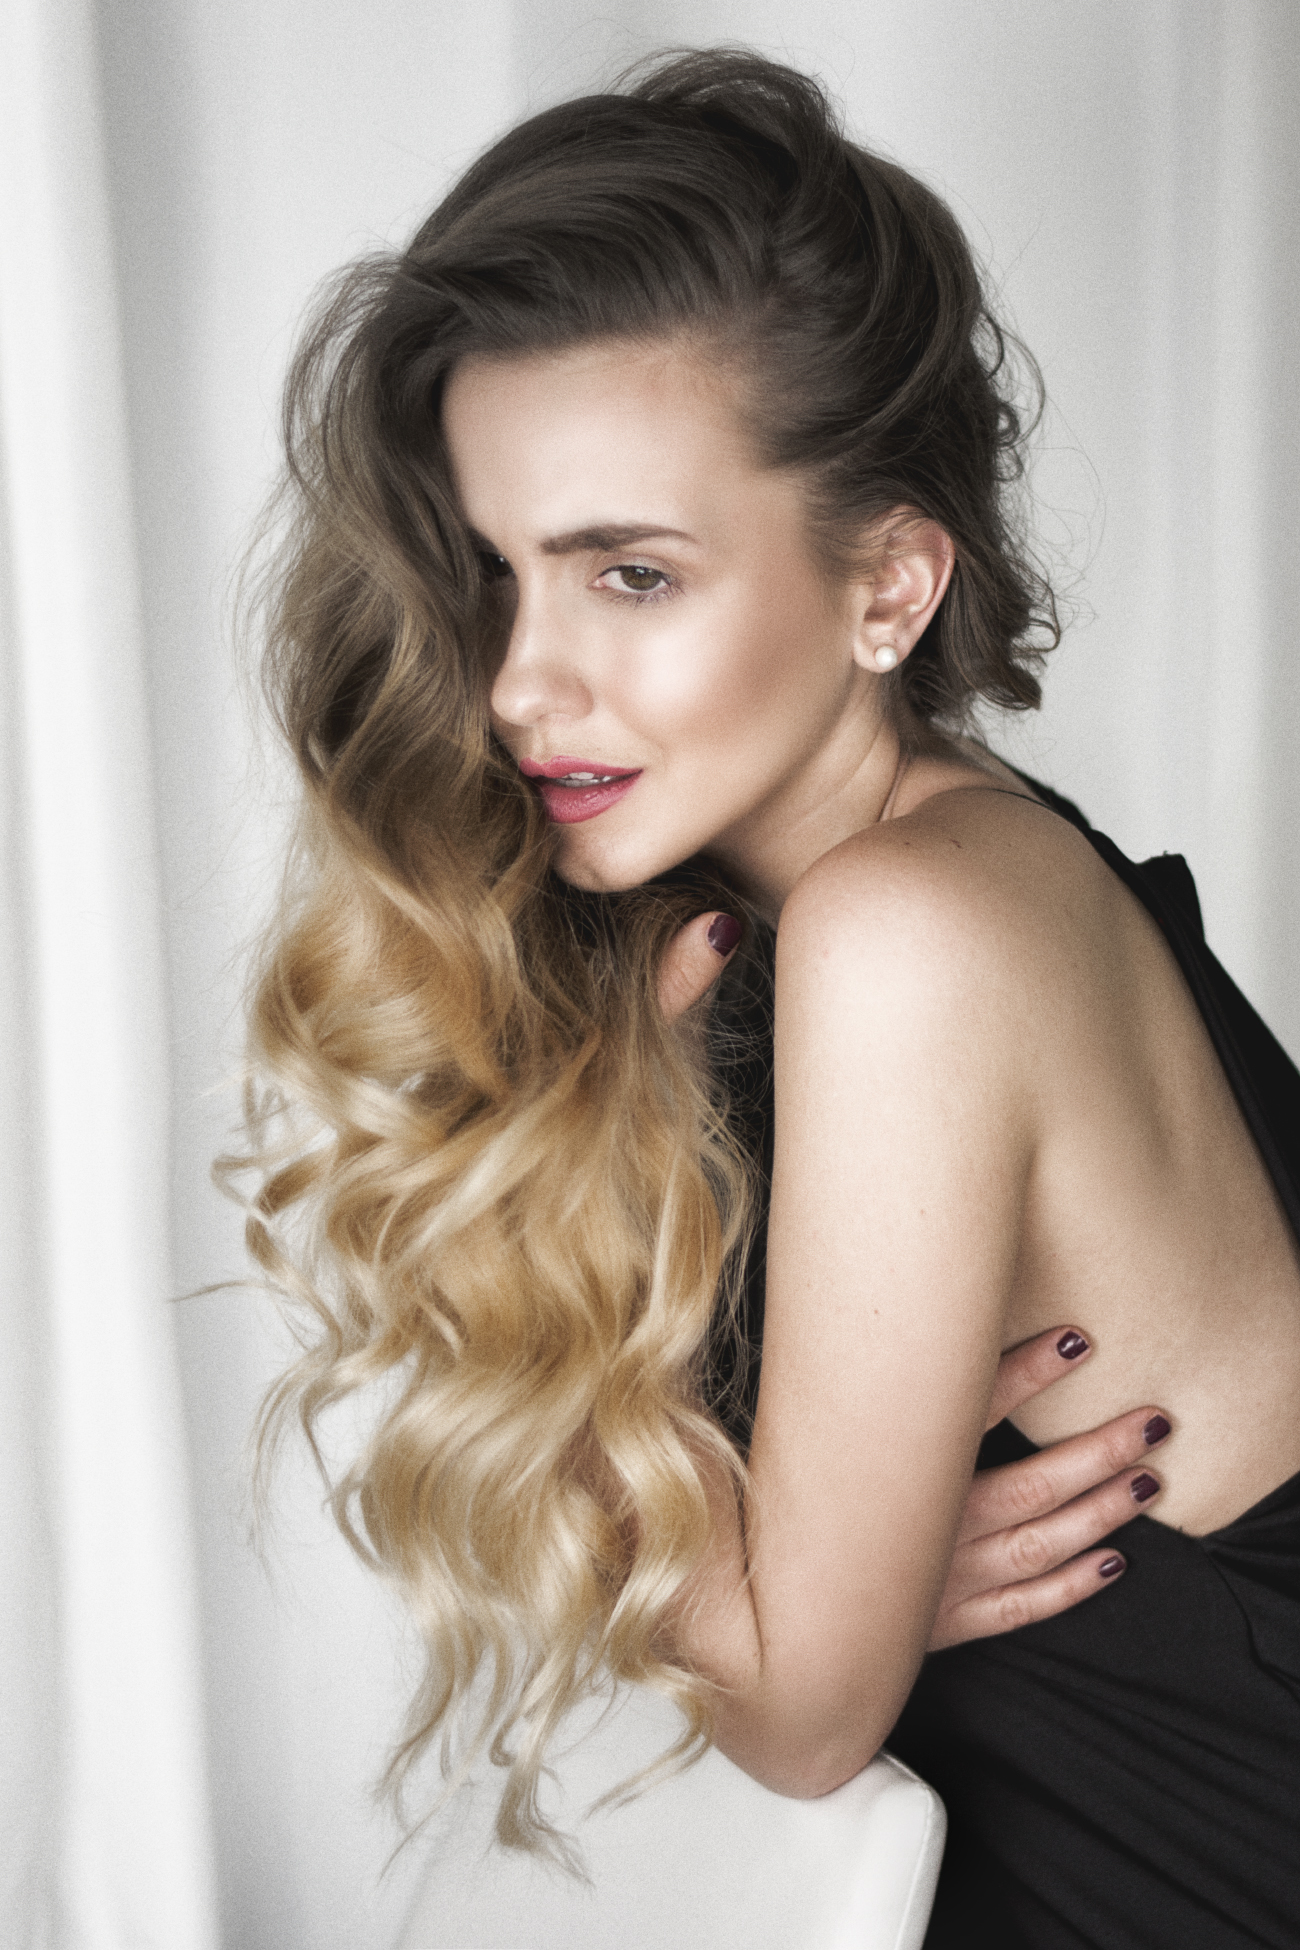 Elvital Tonerde Absolue von L'Oreal Paris Tonerde gegen fettiges Haar und trockene Spitzen @fleurdemode